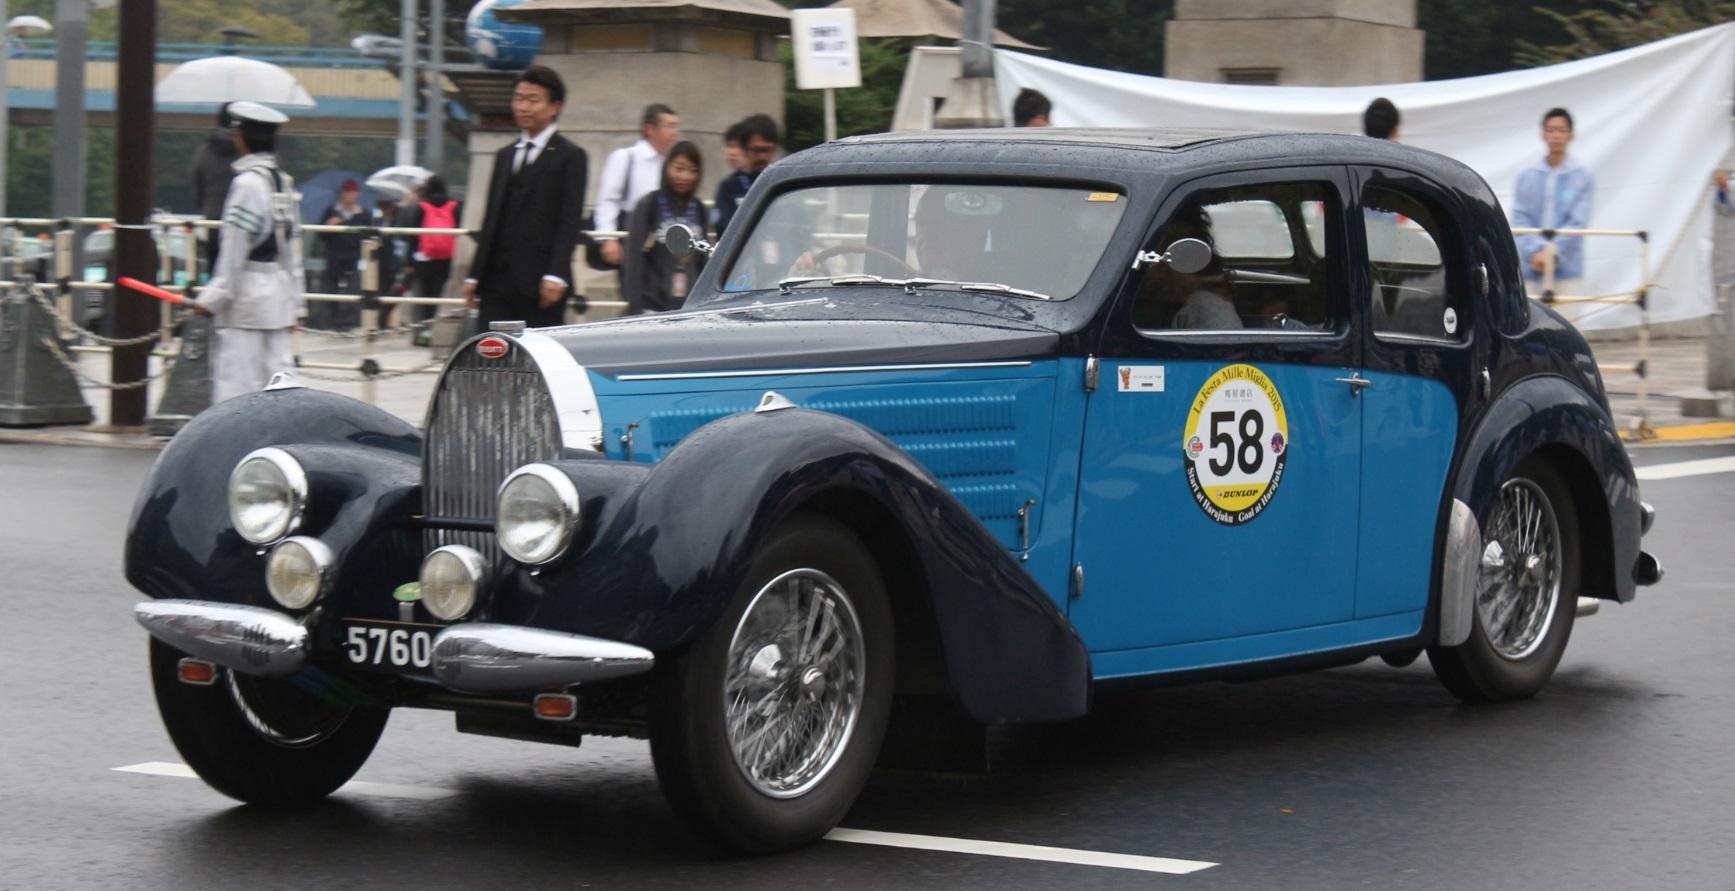 Bugatti, Bugatti T57, Bugatti T57 Galibier, International Bugatti Meeting Japan, La Festa Mille Miglia, LFMM, T57 Galibier, ブガッティ, ラフェスタミレミリア